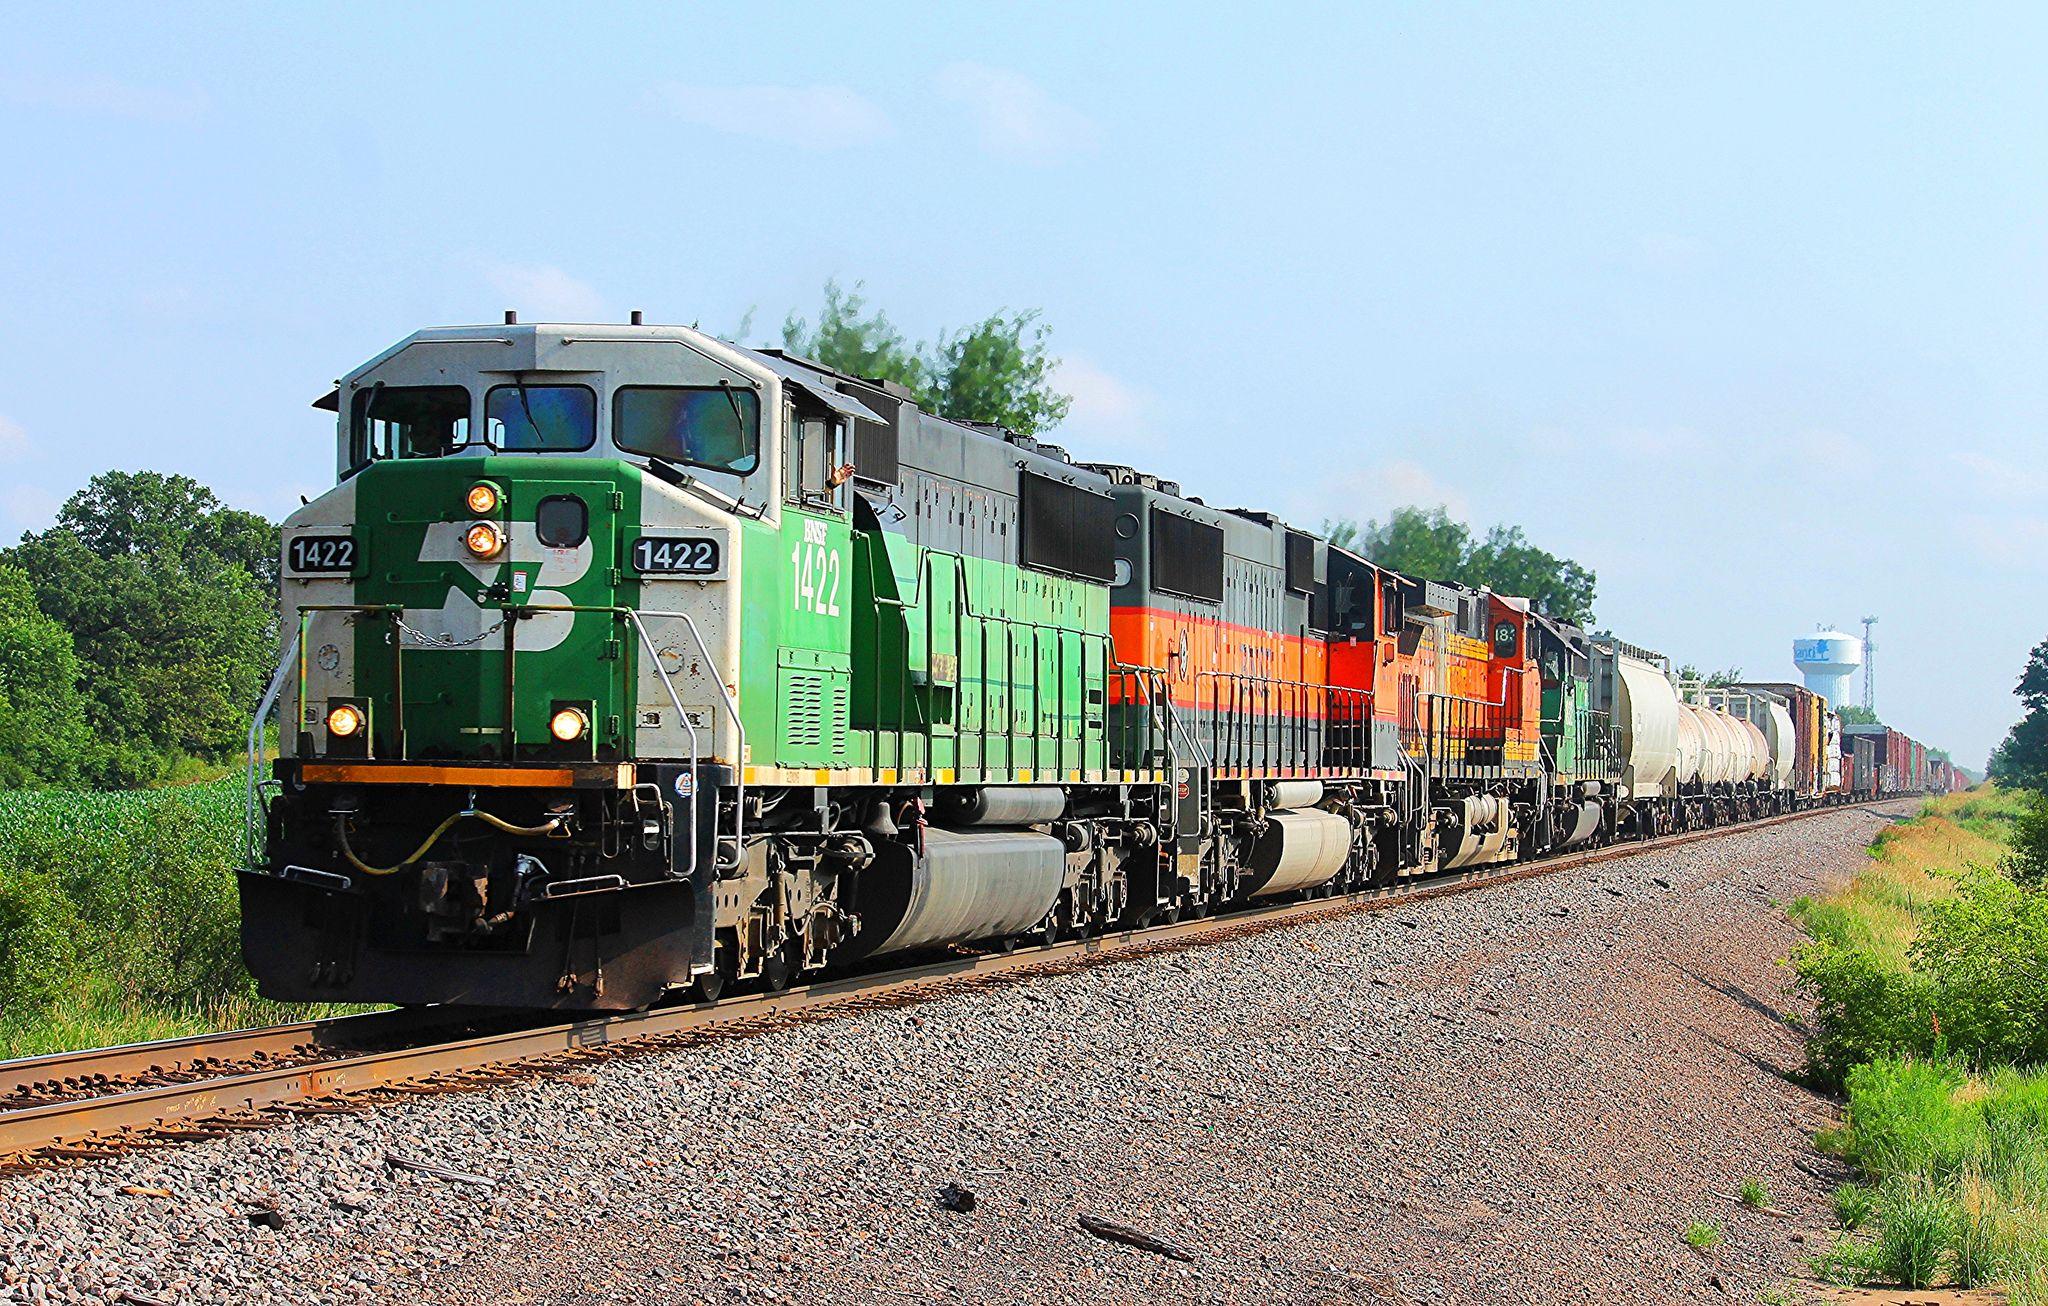 bnsf 1422 locomotive and bnsf railway